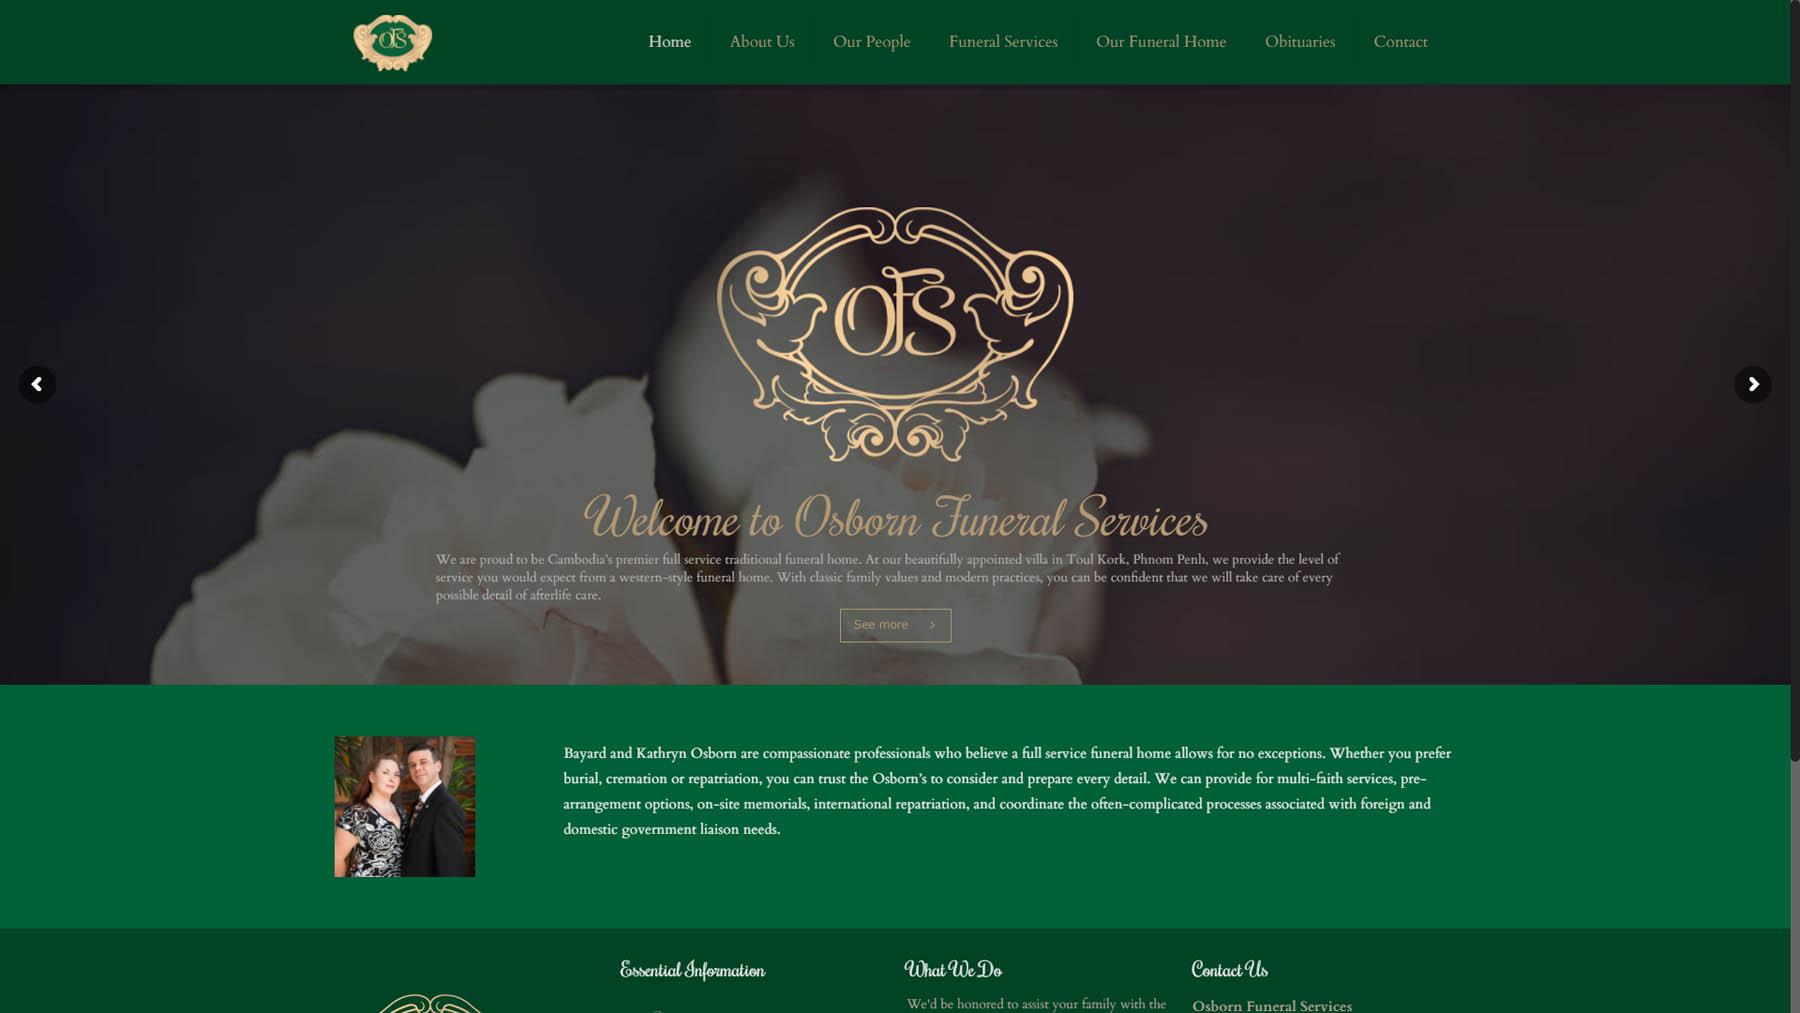 Osborn Funeral Services Website Design | Joe Ogden | Cambodia